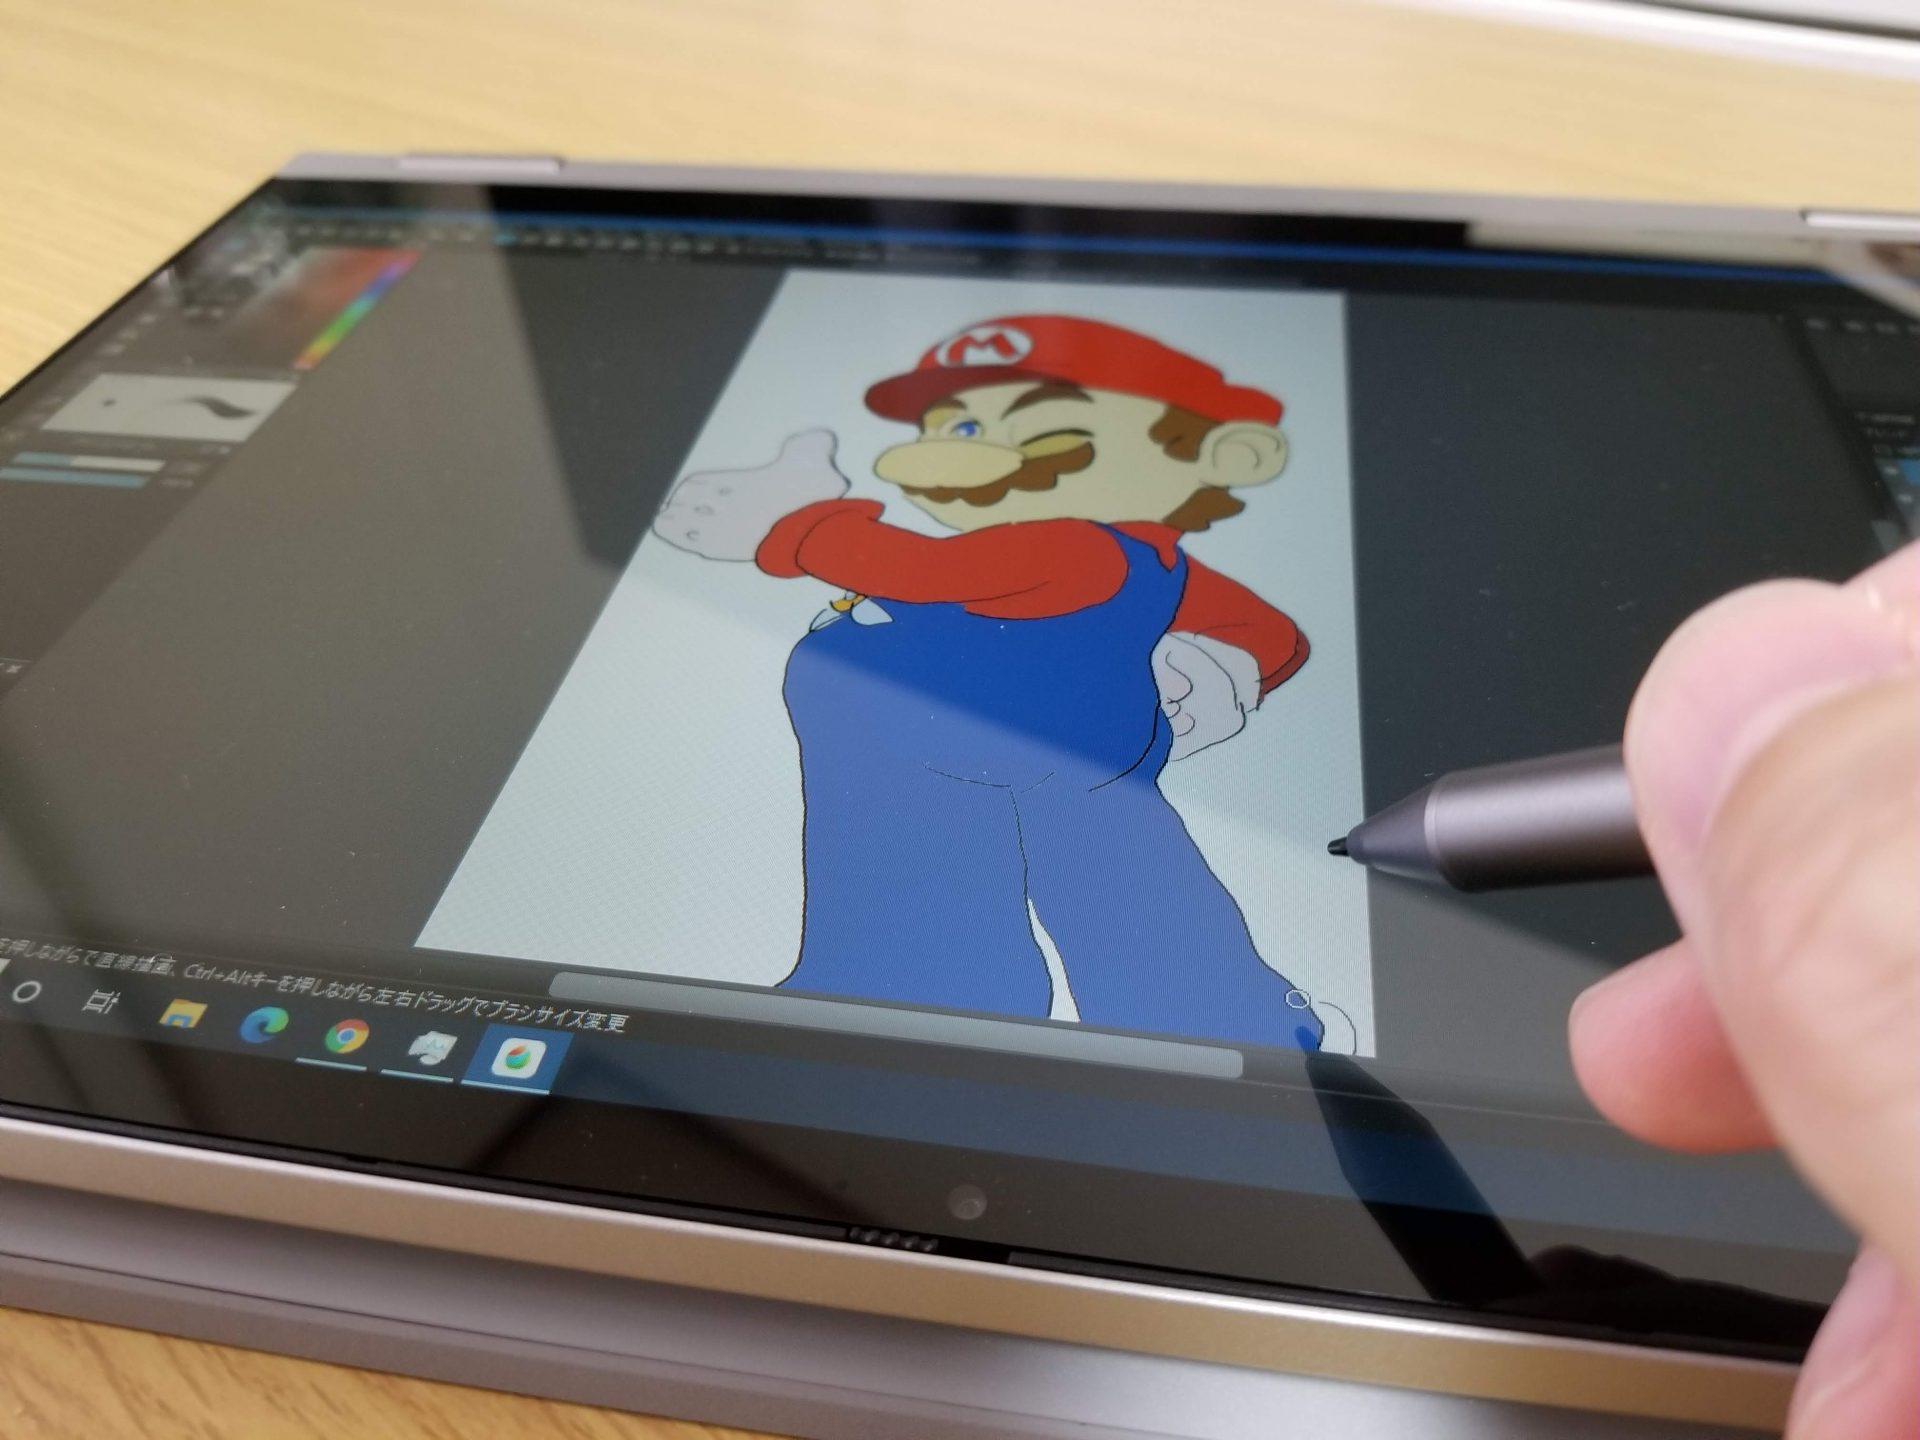 IdeaPad Flex 550(14)でマリオの絵を描く